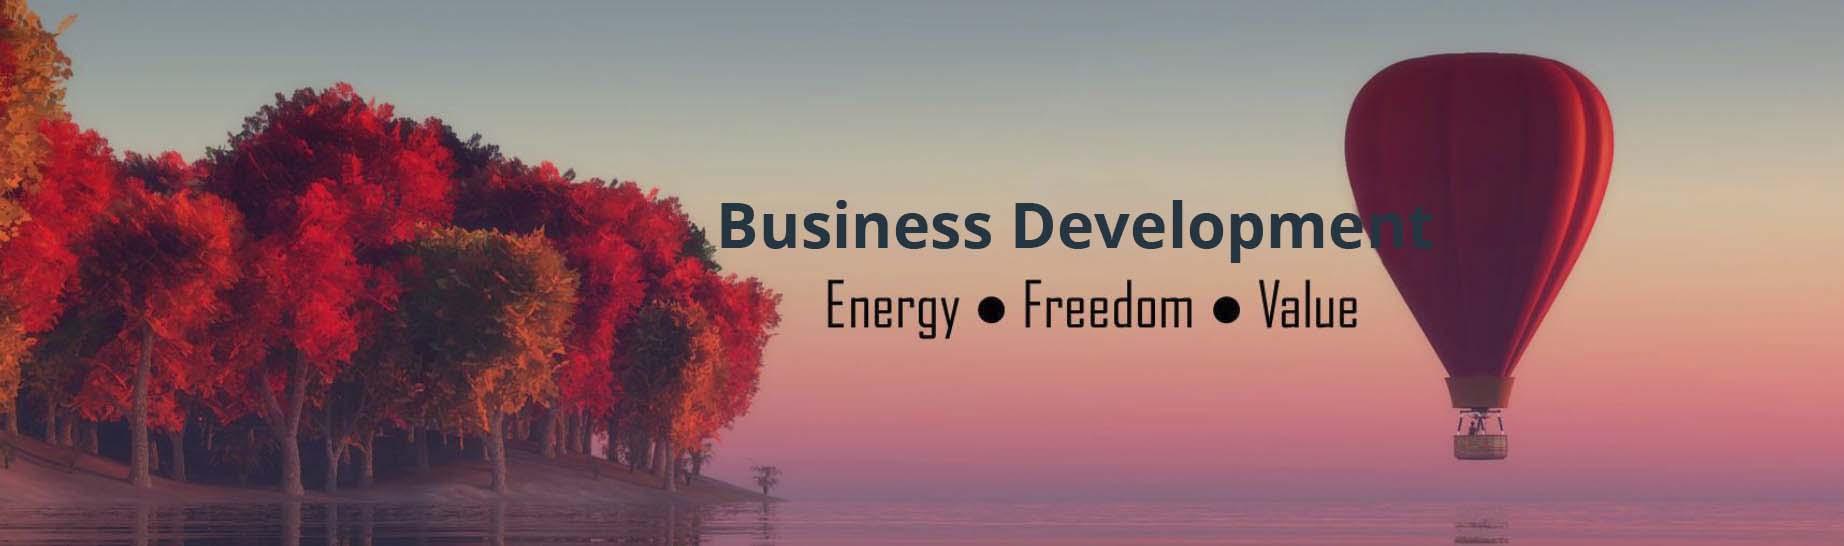 business_dev_banner_2